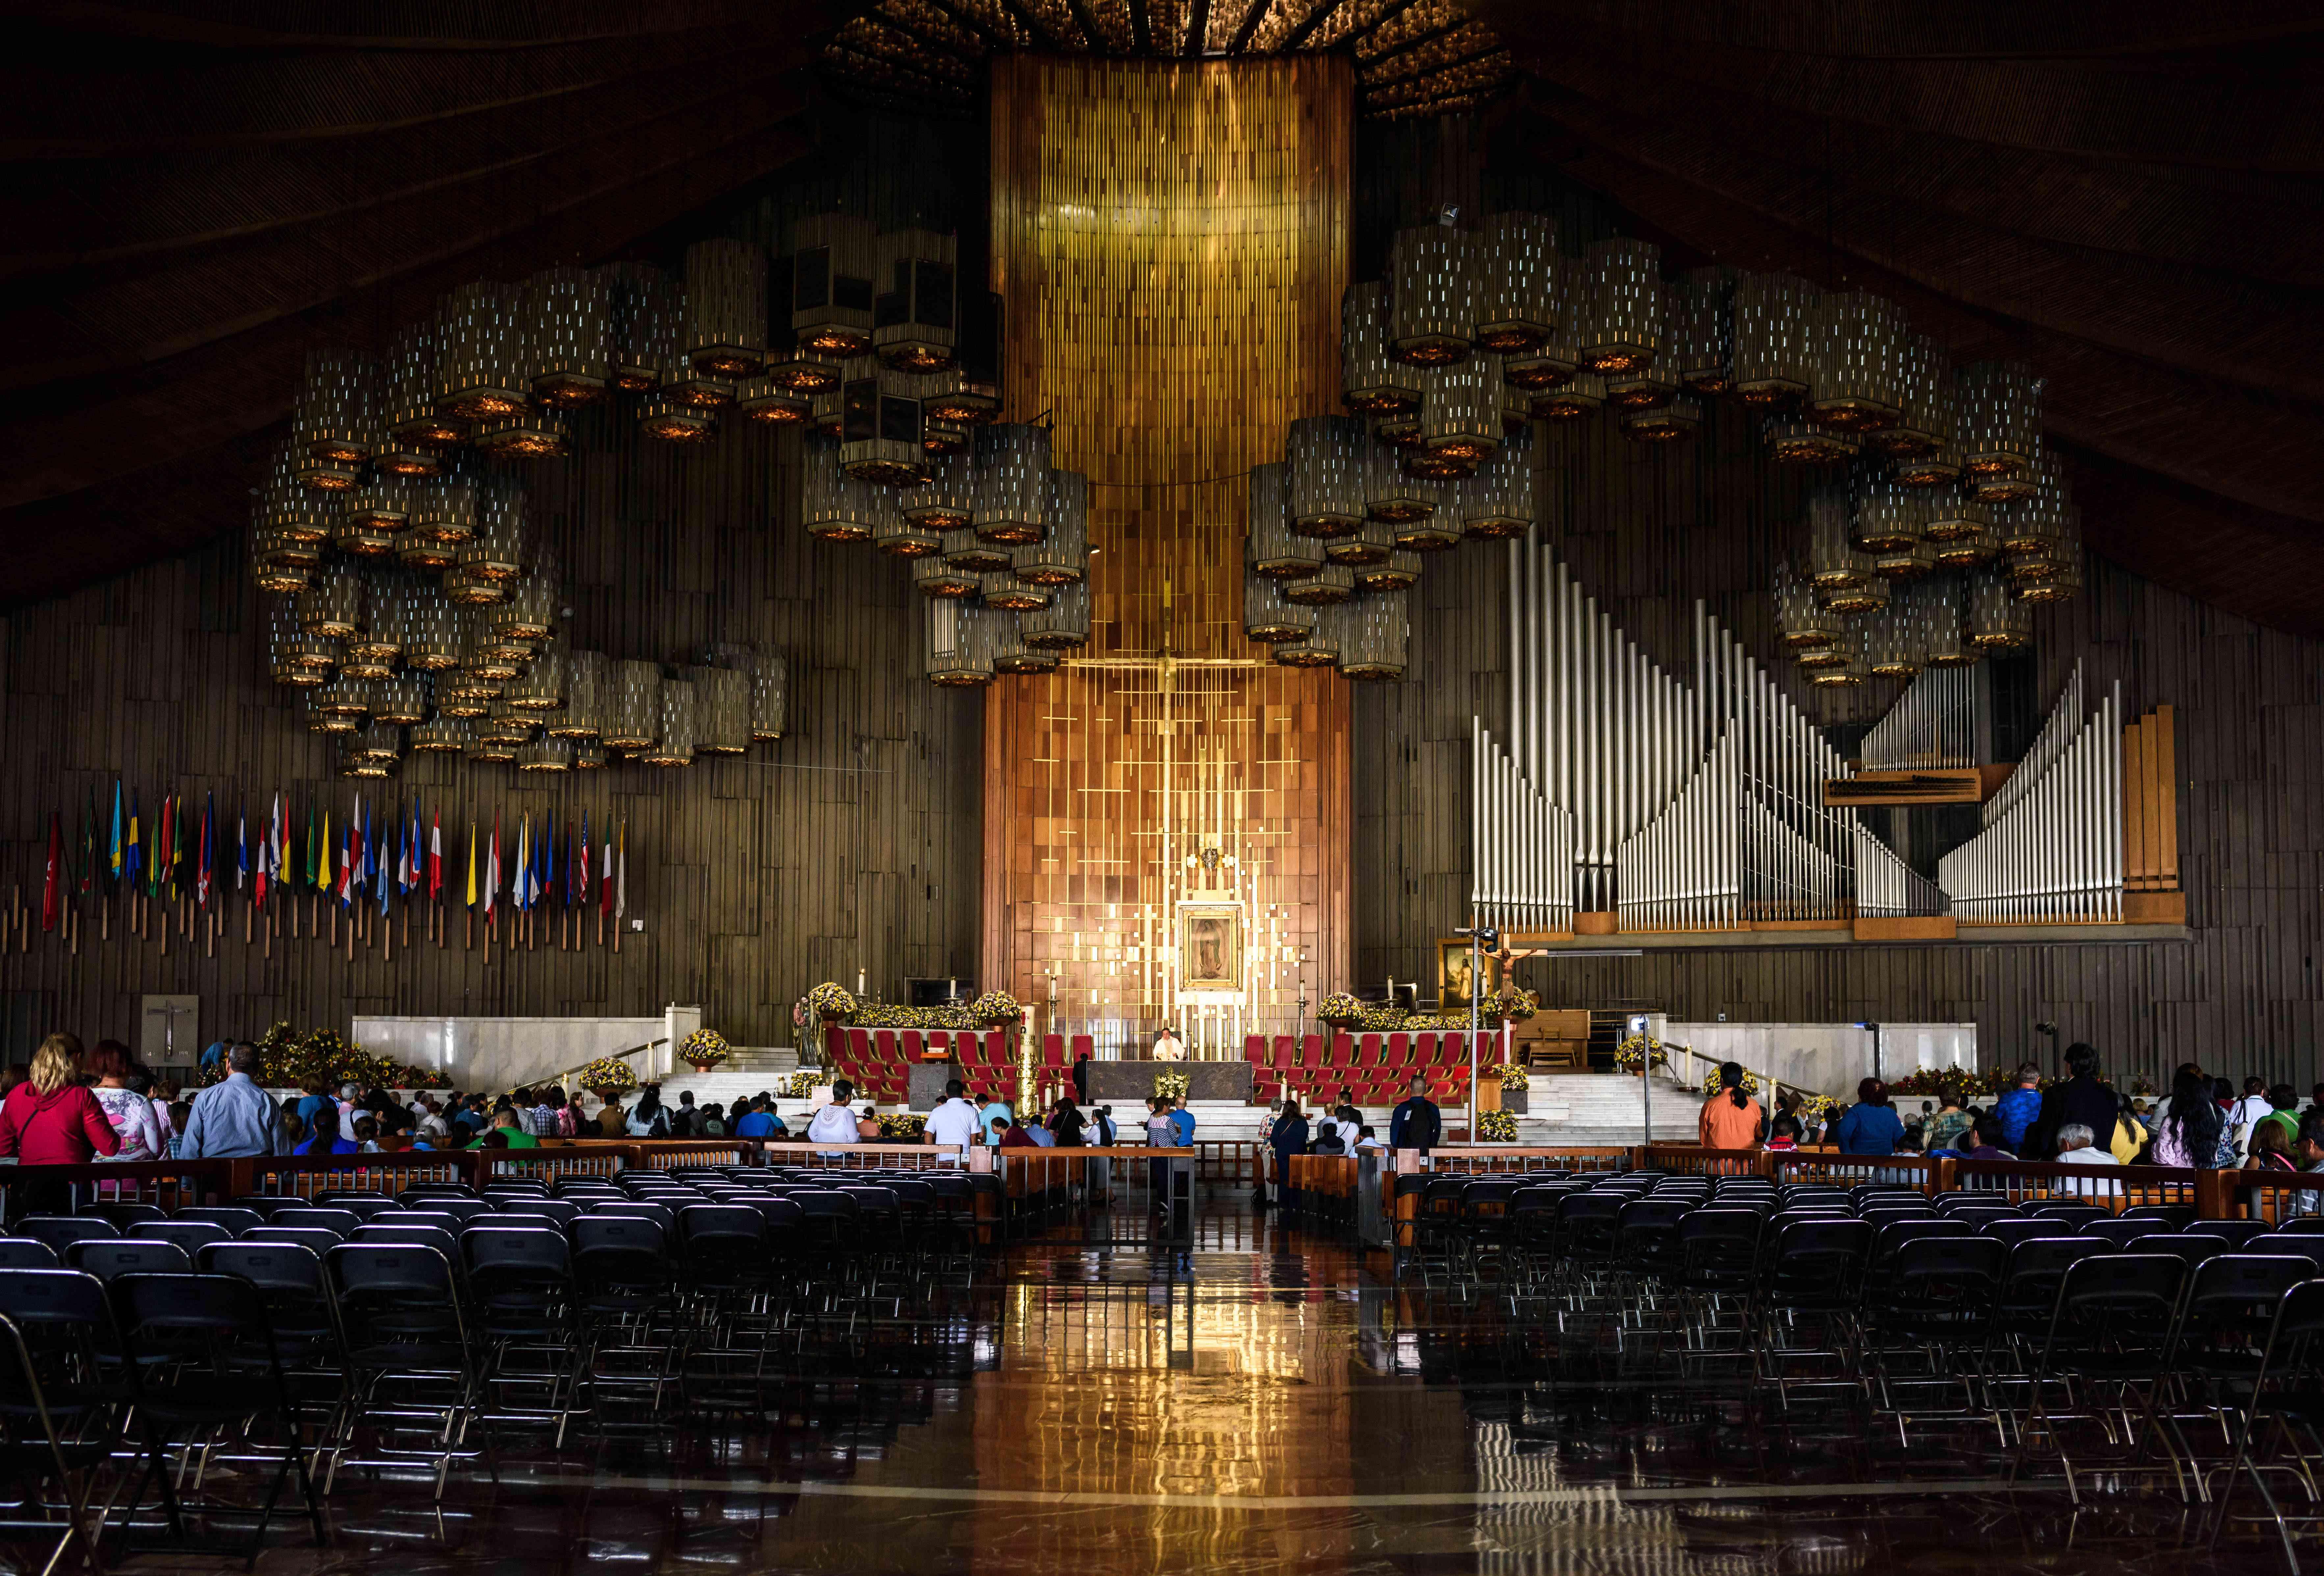 Inside the Basillica de Guadalupe